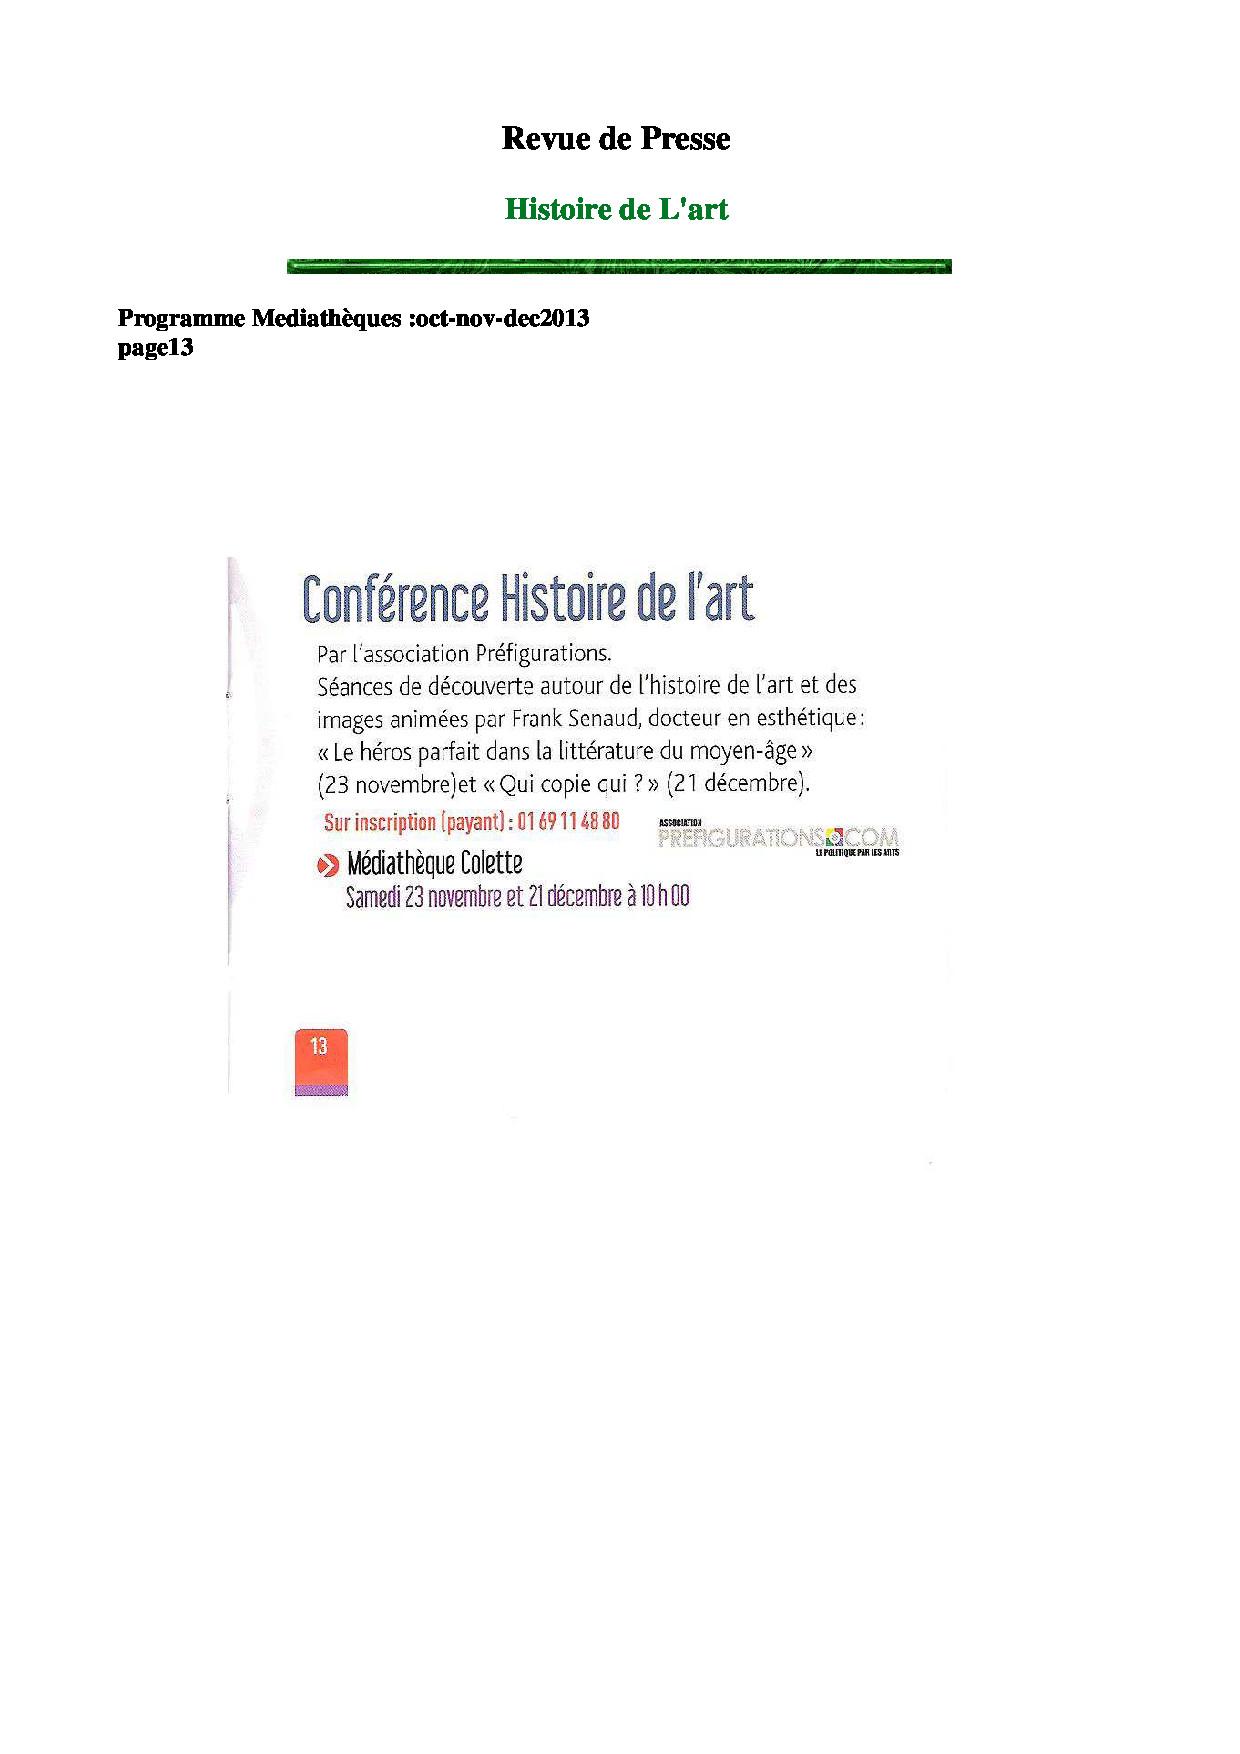 RDP programme des médiathèques oct-nov-dec 2013